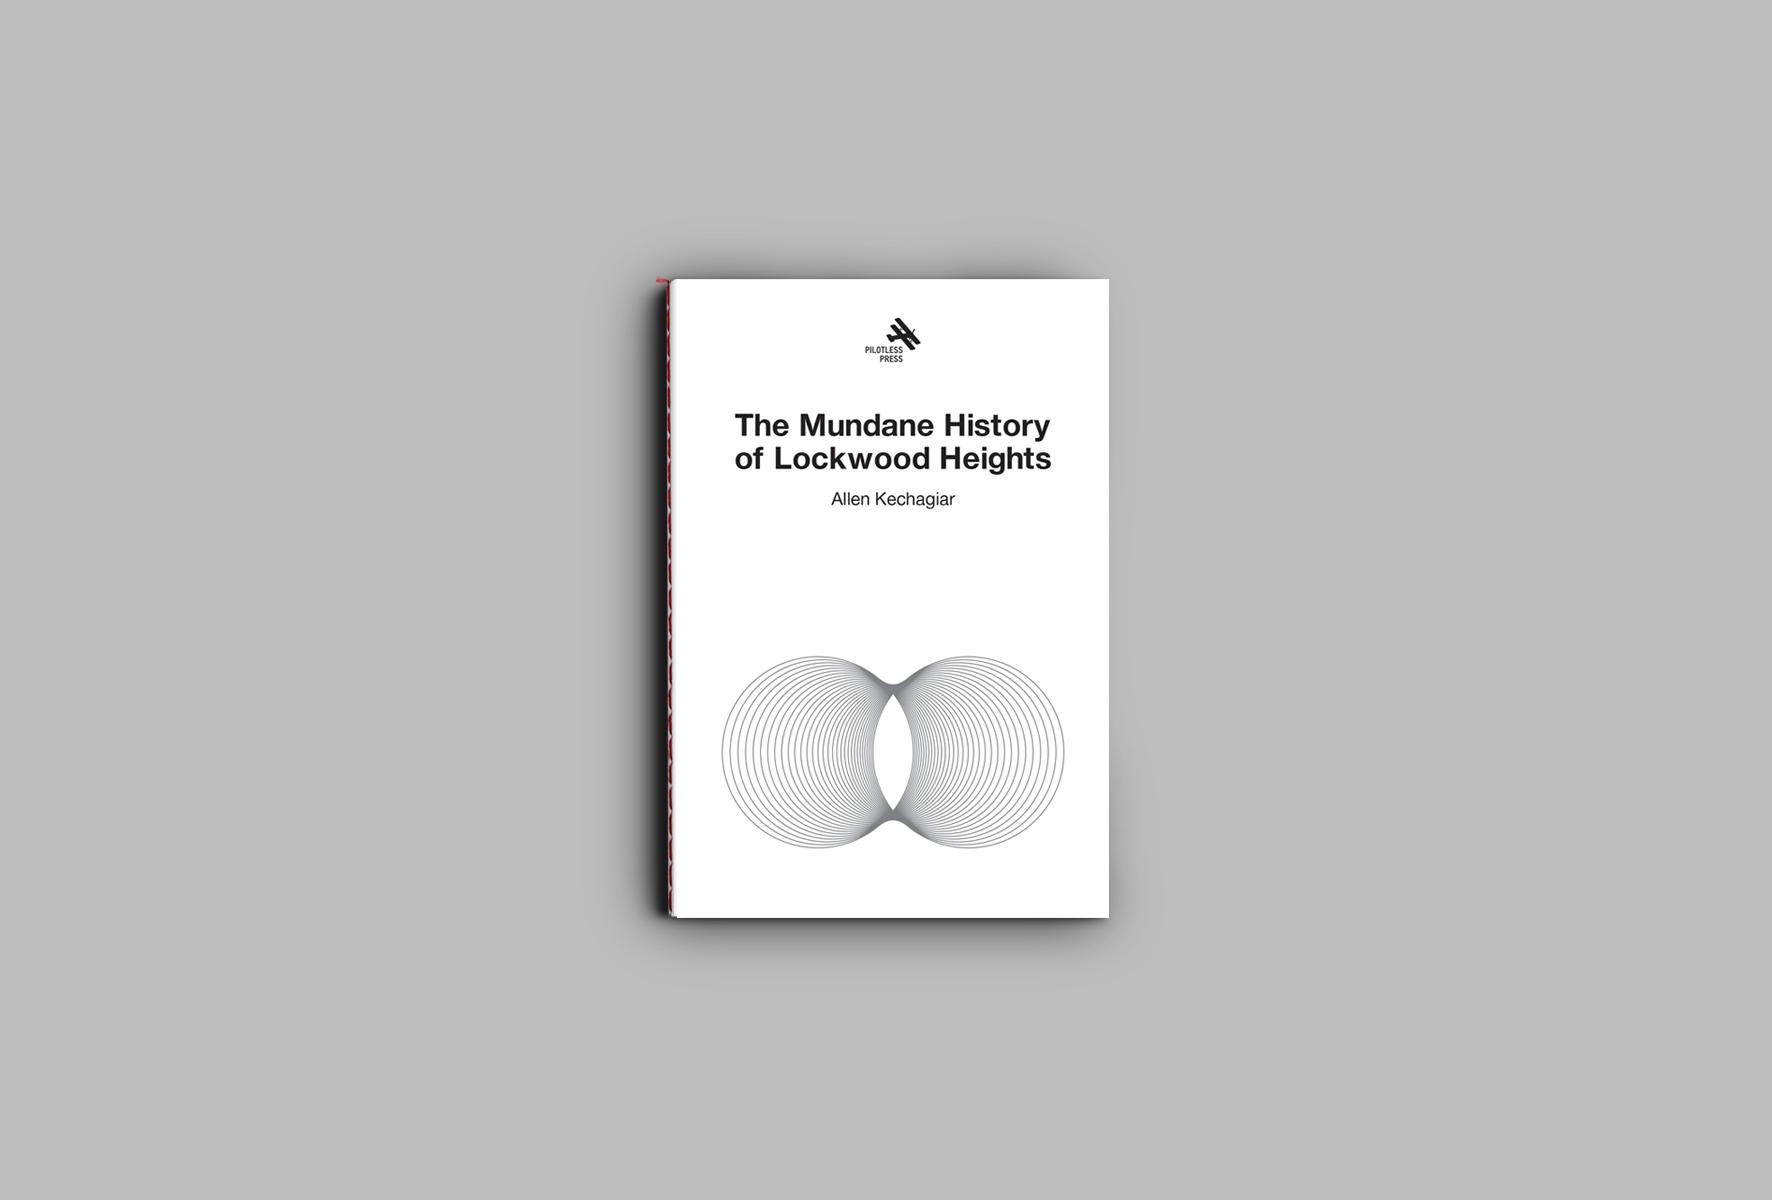 The Mundane History of Lockwood Heights, 2nd Edition